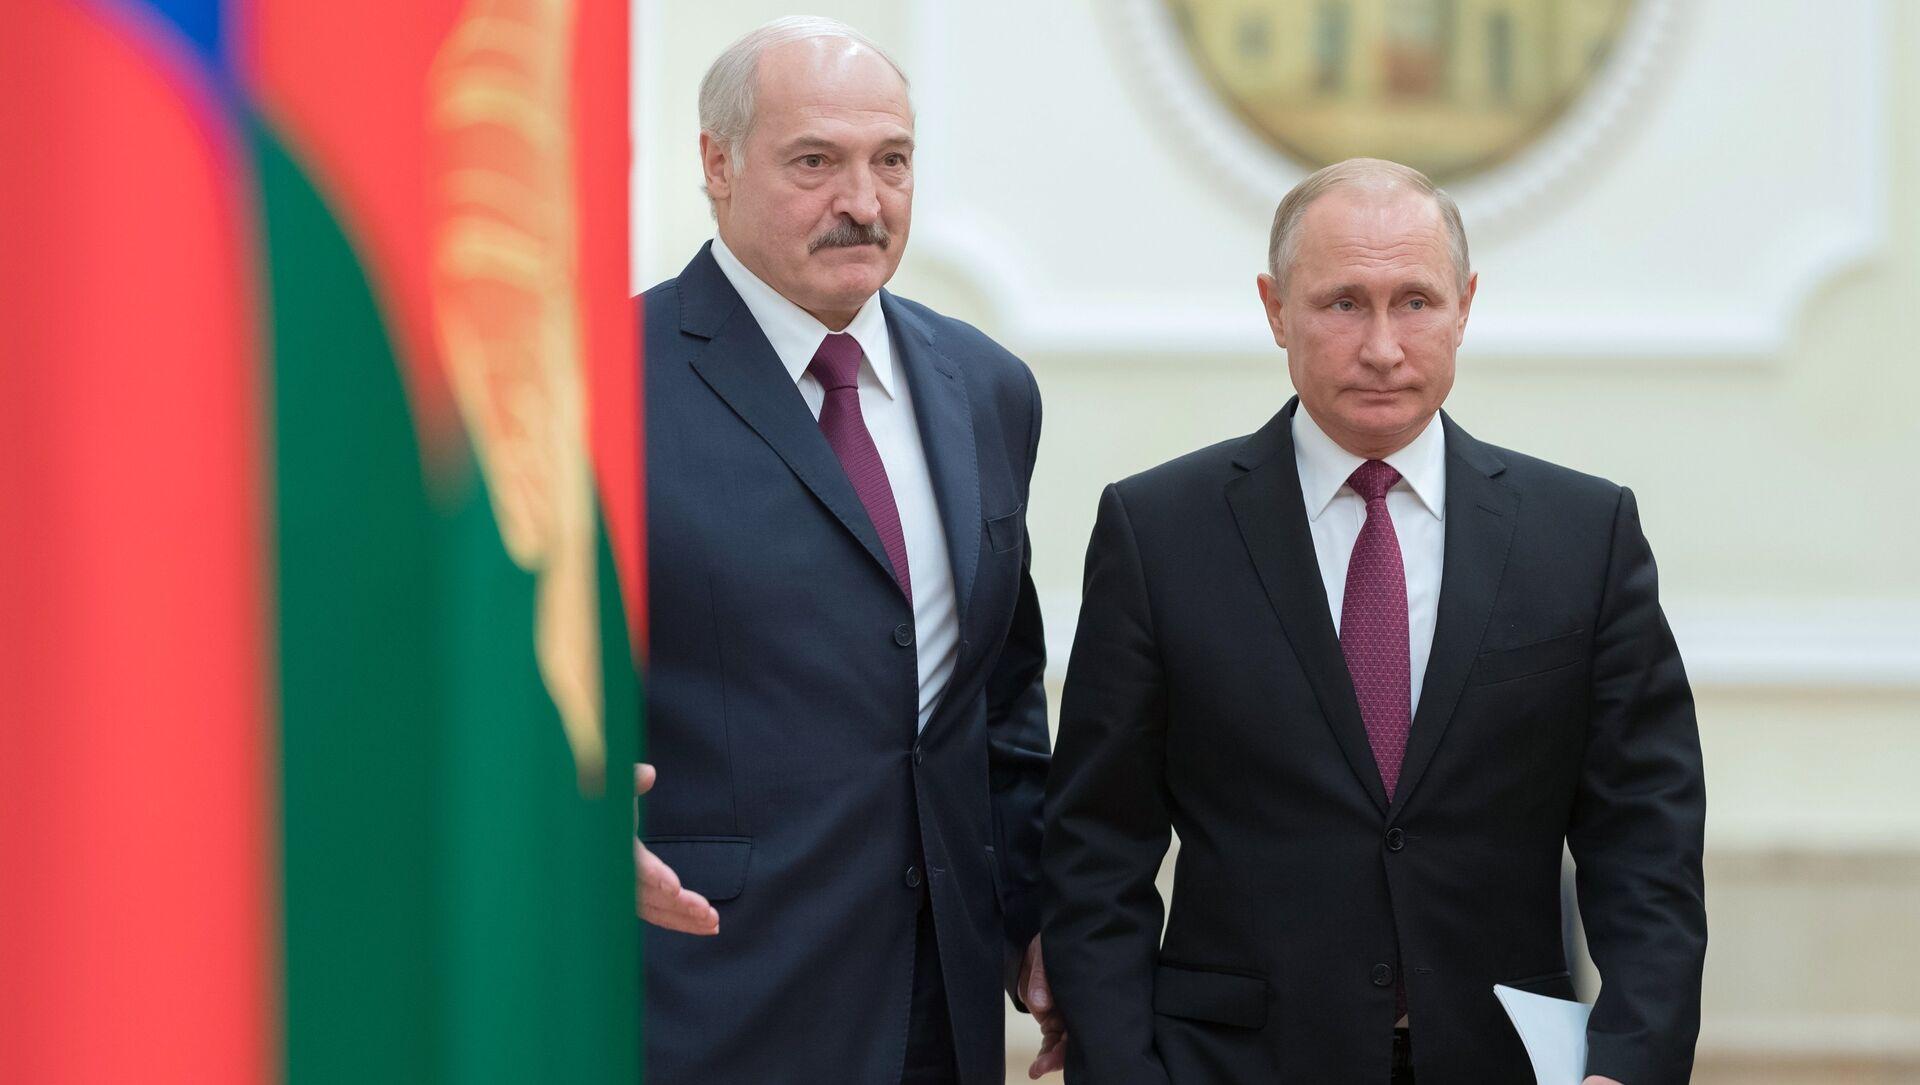 Alexandre Loukachenko et Vladimir Poutine - Sputnik France, 1920, 12.09.2021